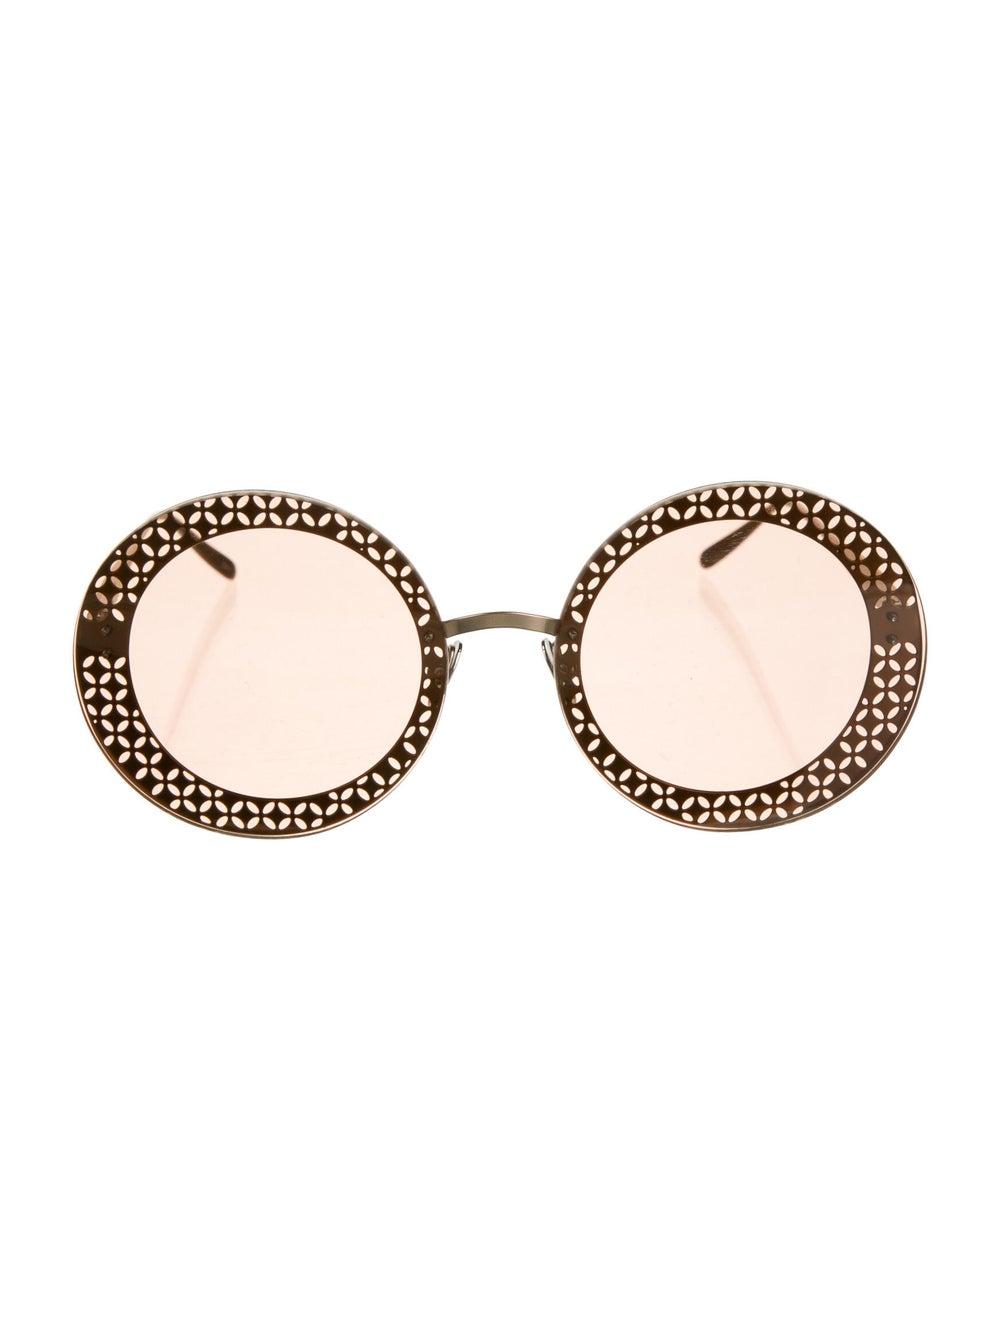 Alaïa Round Tinted Sunglasses - image 1